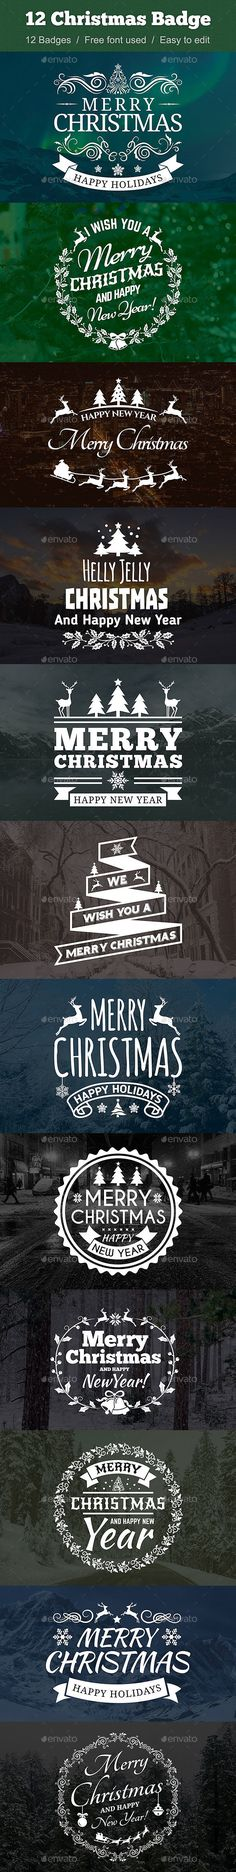 12 Christmas Badges Template #design Download: http://graphicriver.net/item/12-christmas-badge/13593433?ref=ksioks